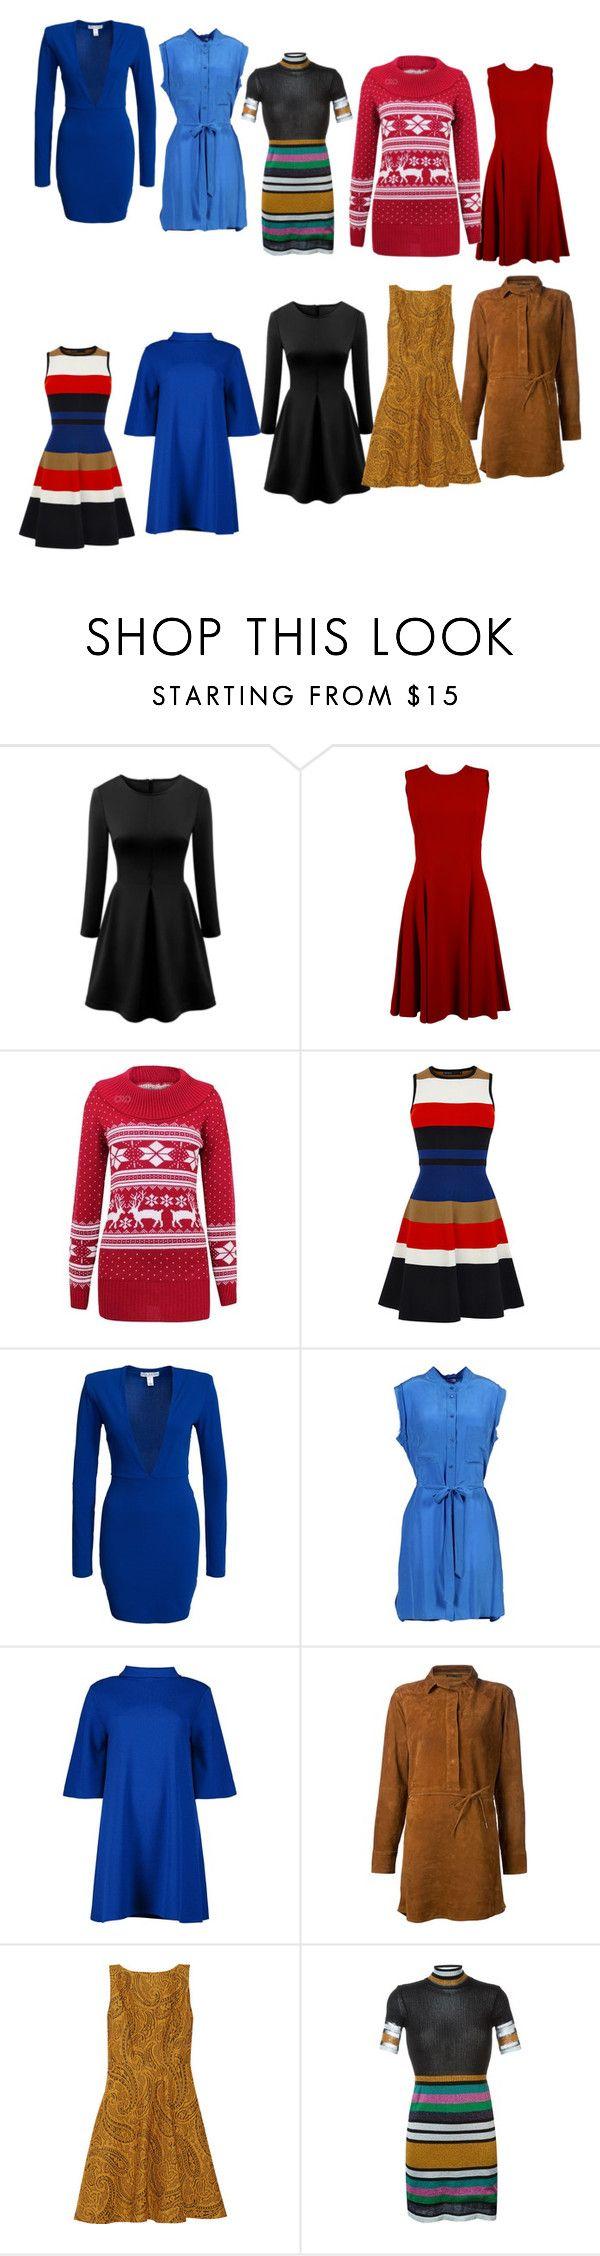 """платя"" by artemia-13 on Polyvore featuring мода, Dolce&Gabbana, NLY Trend, Equipment, rag & bone, Alice + Olivia и Diesel"